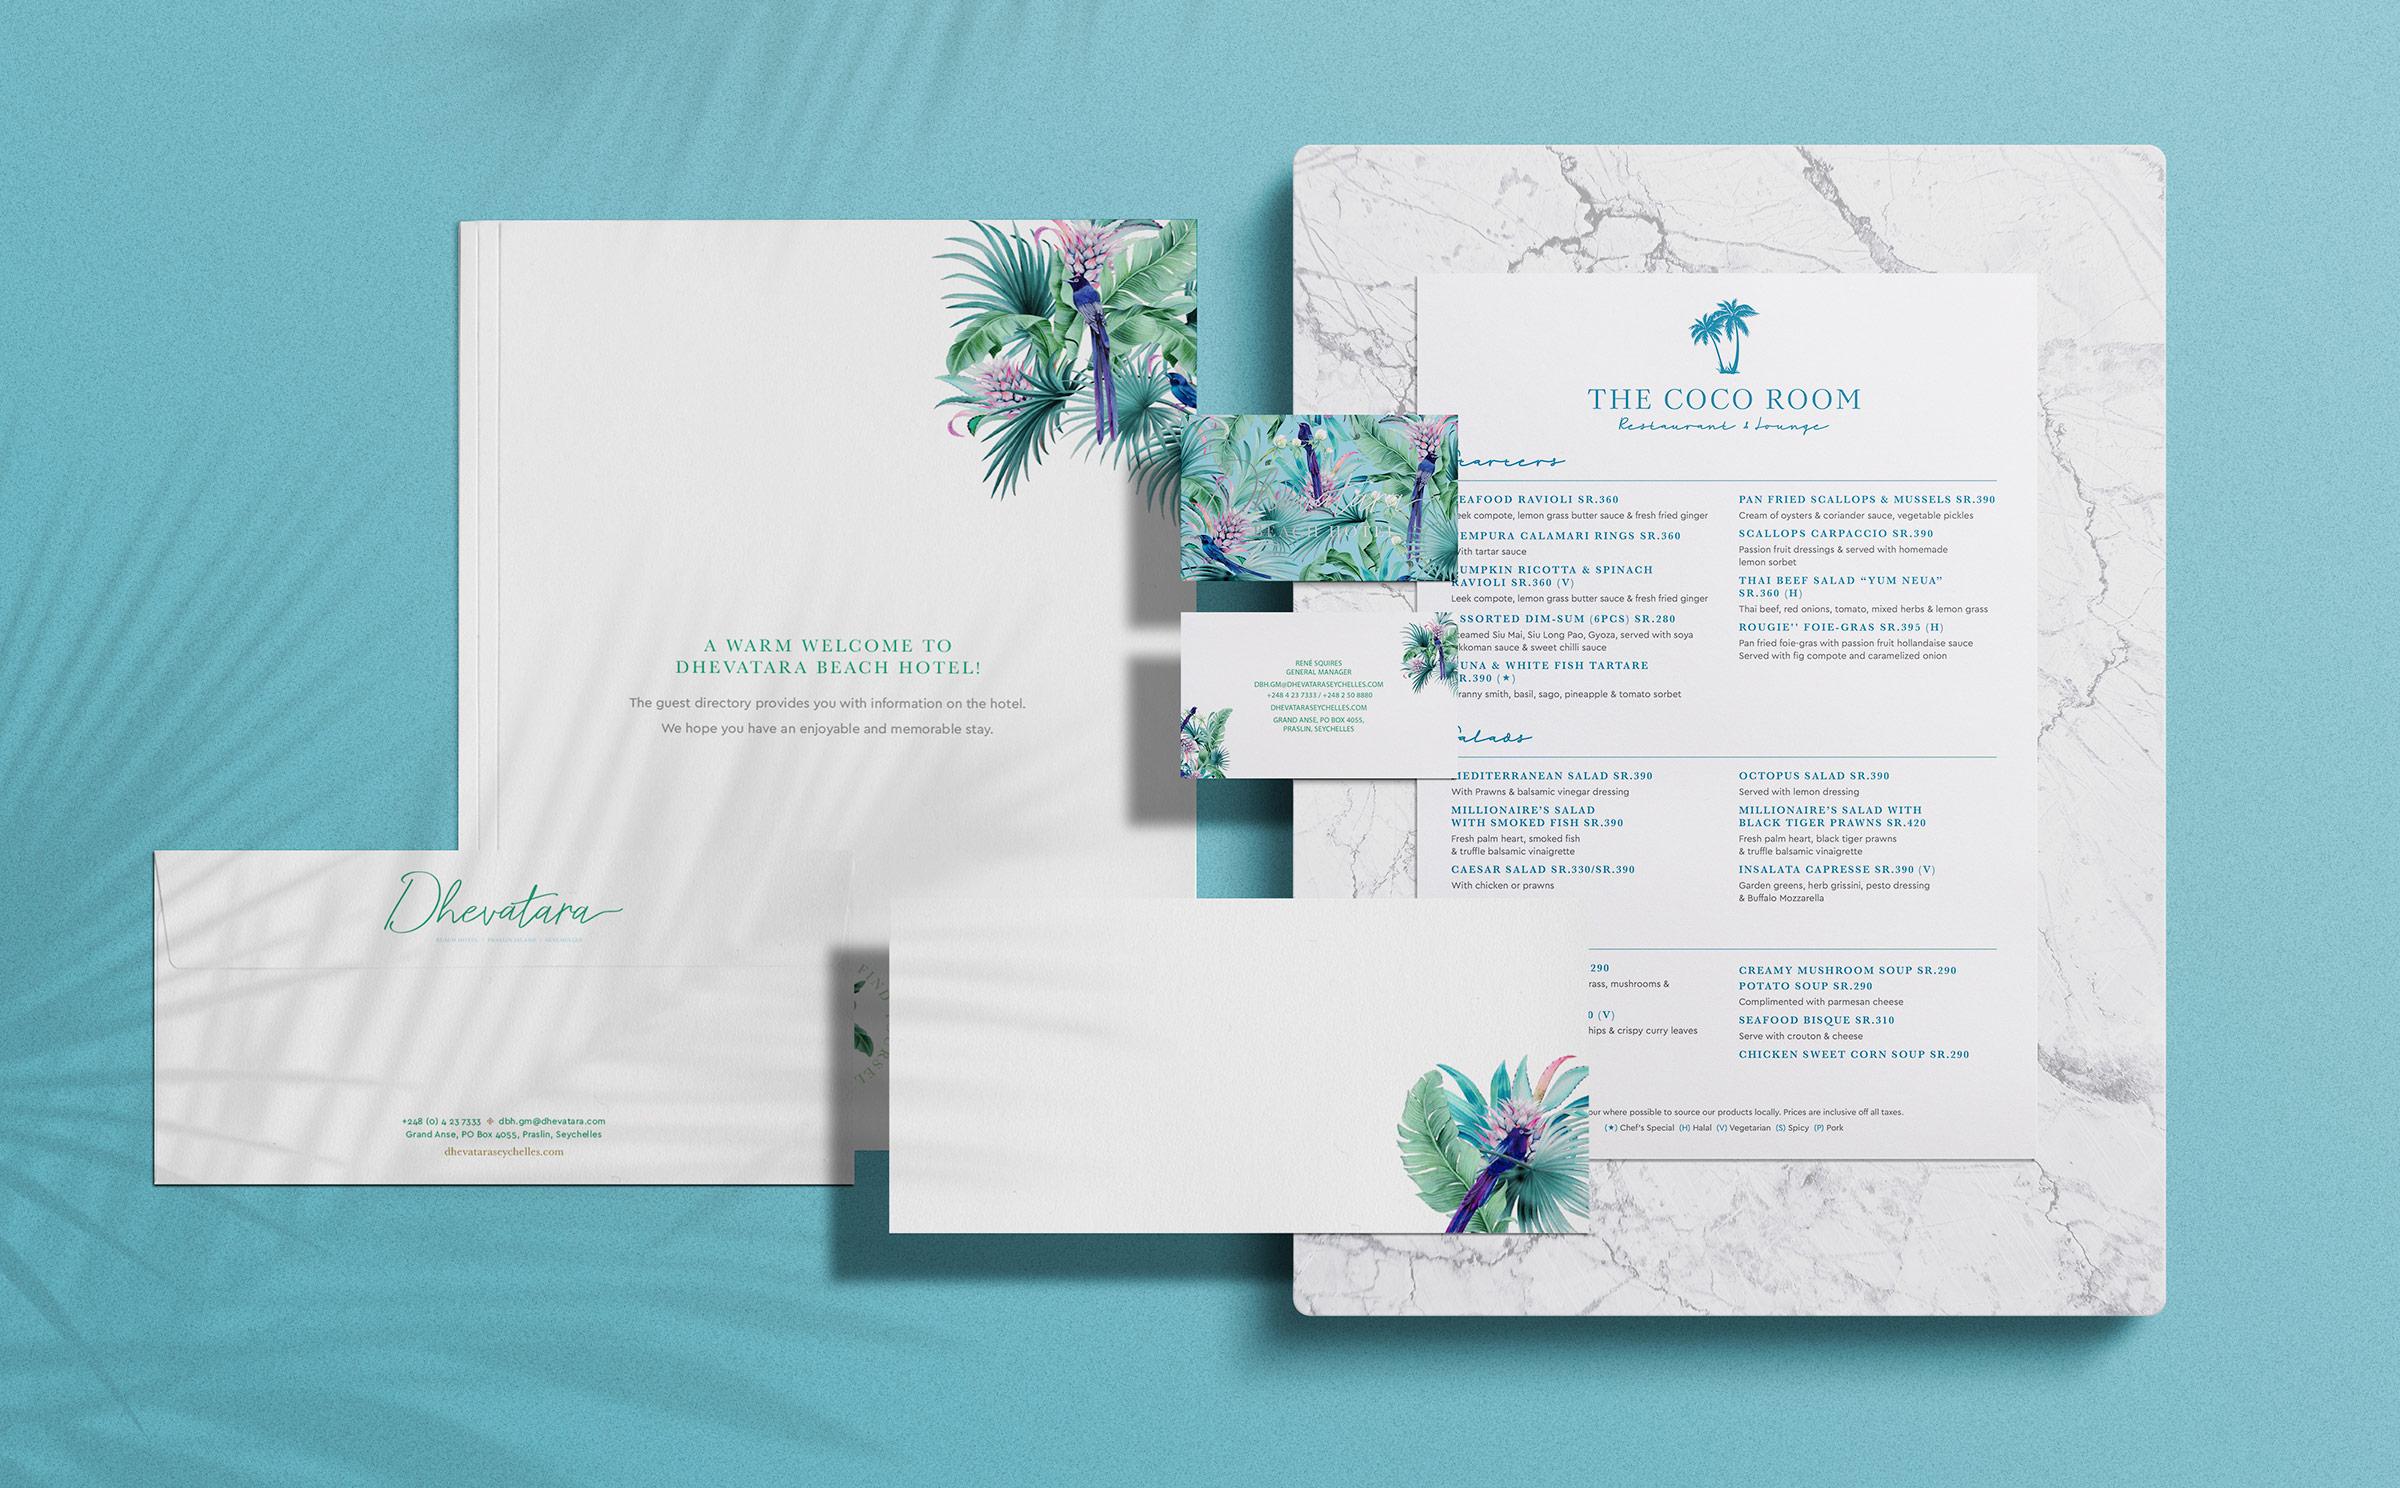 Dhevatara-Beach-Hotel-Stationery-Design